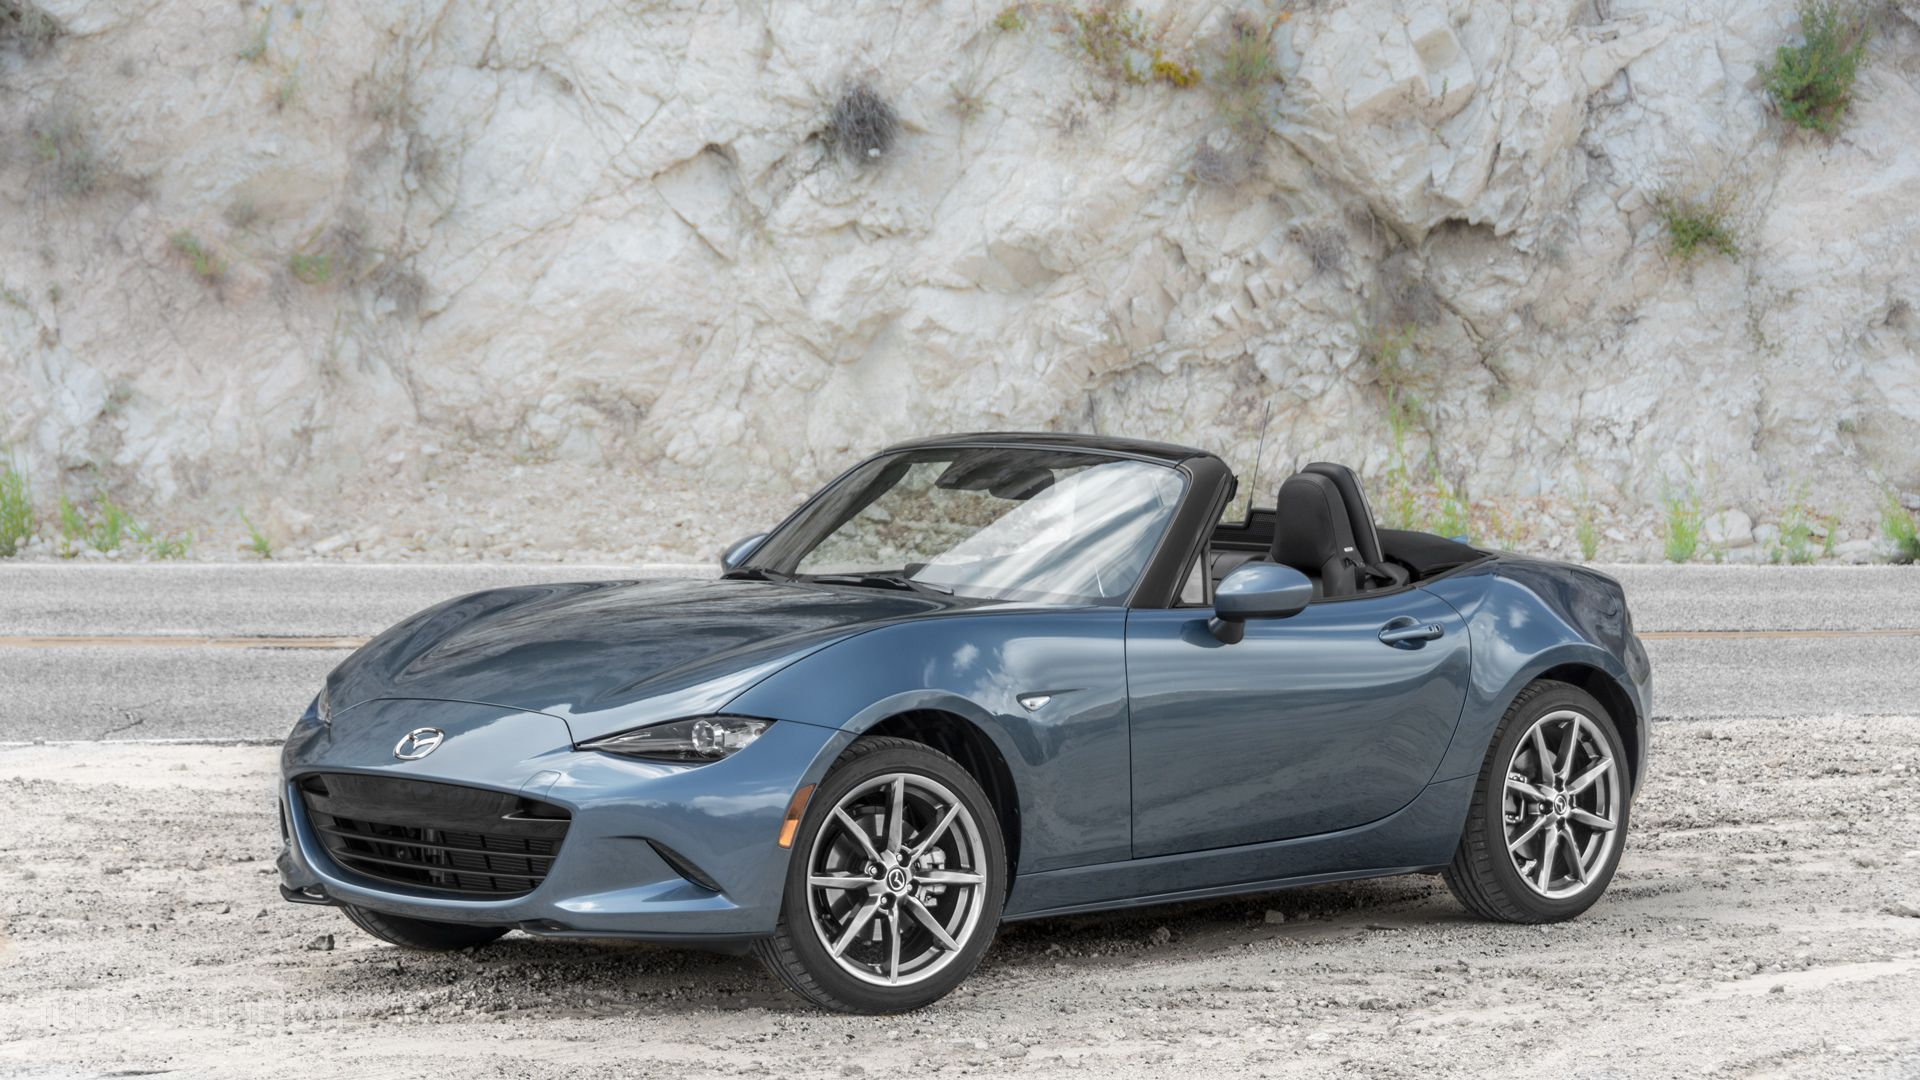 Mazda Miata Photos